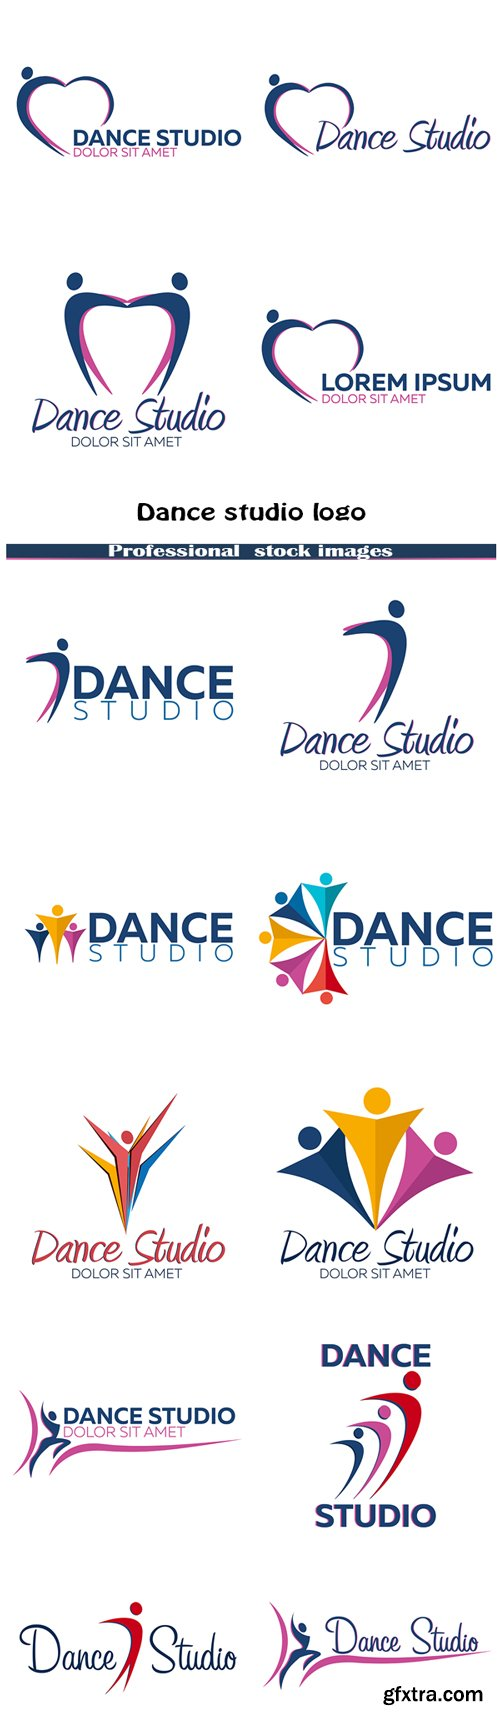 Dance Studio Logos 14xEPS